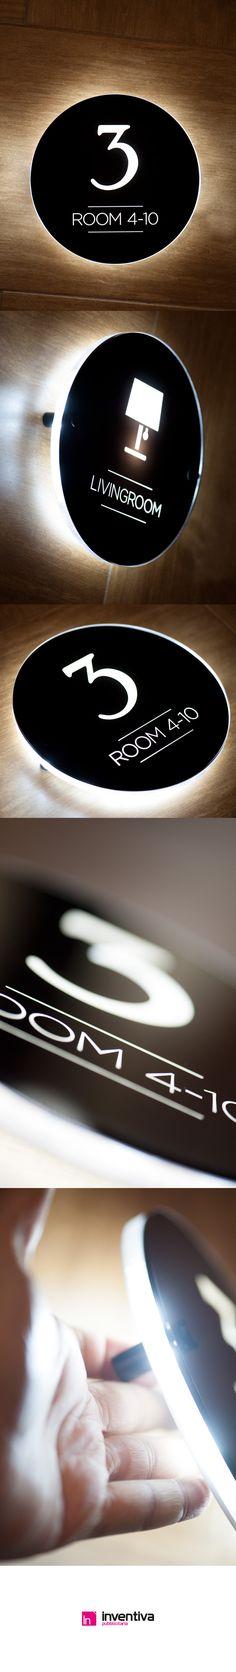 #signage #led #hotels Segnaletica luminosa hotels  http://www.inventivashop.com/targhe-luminose-led-a-parete-25